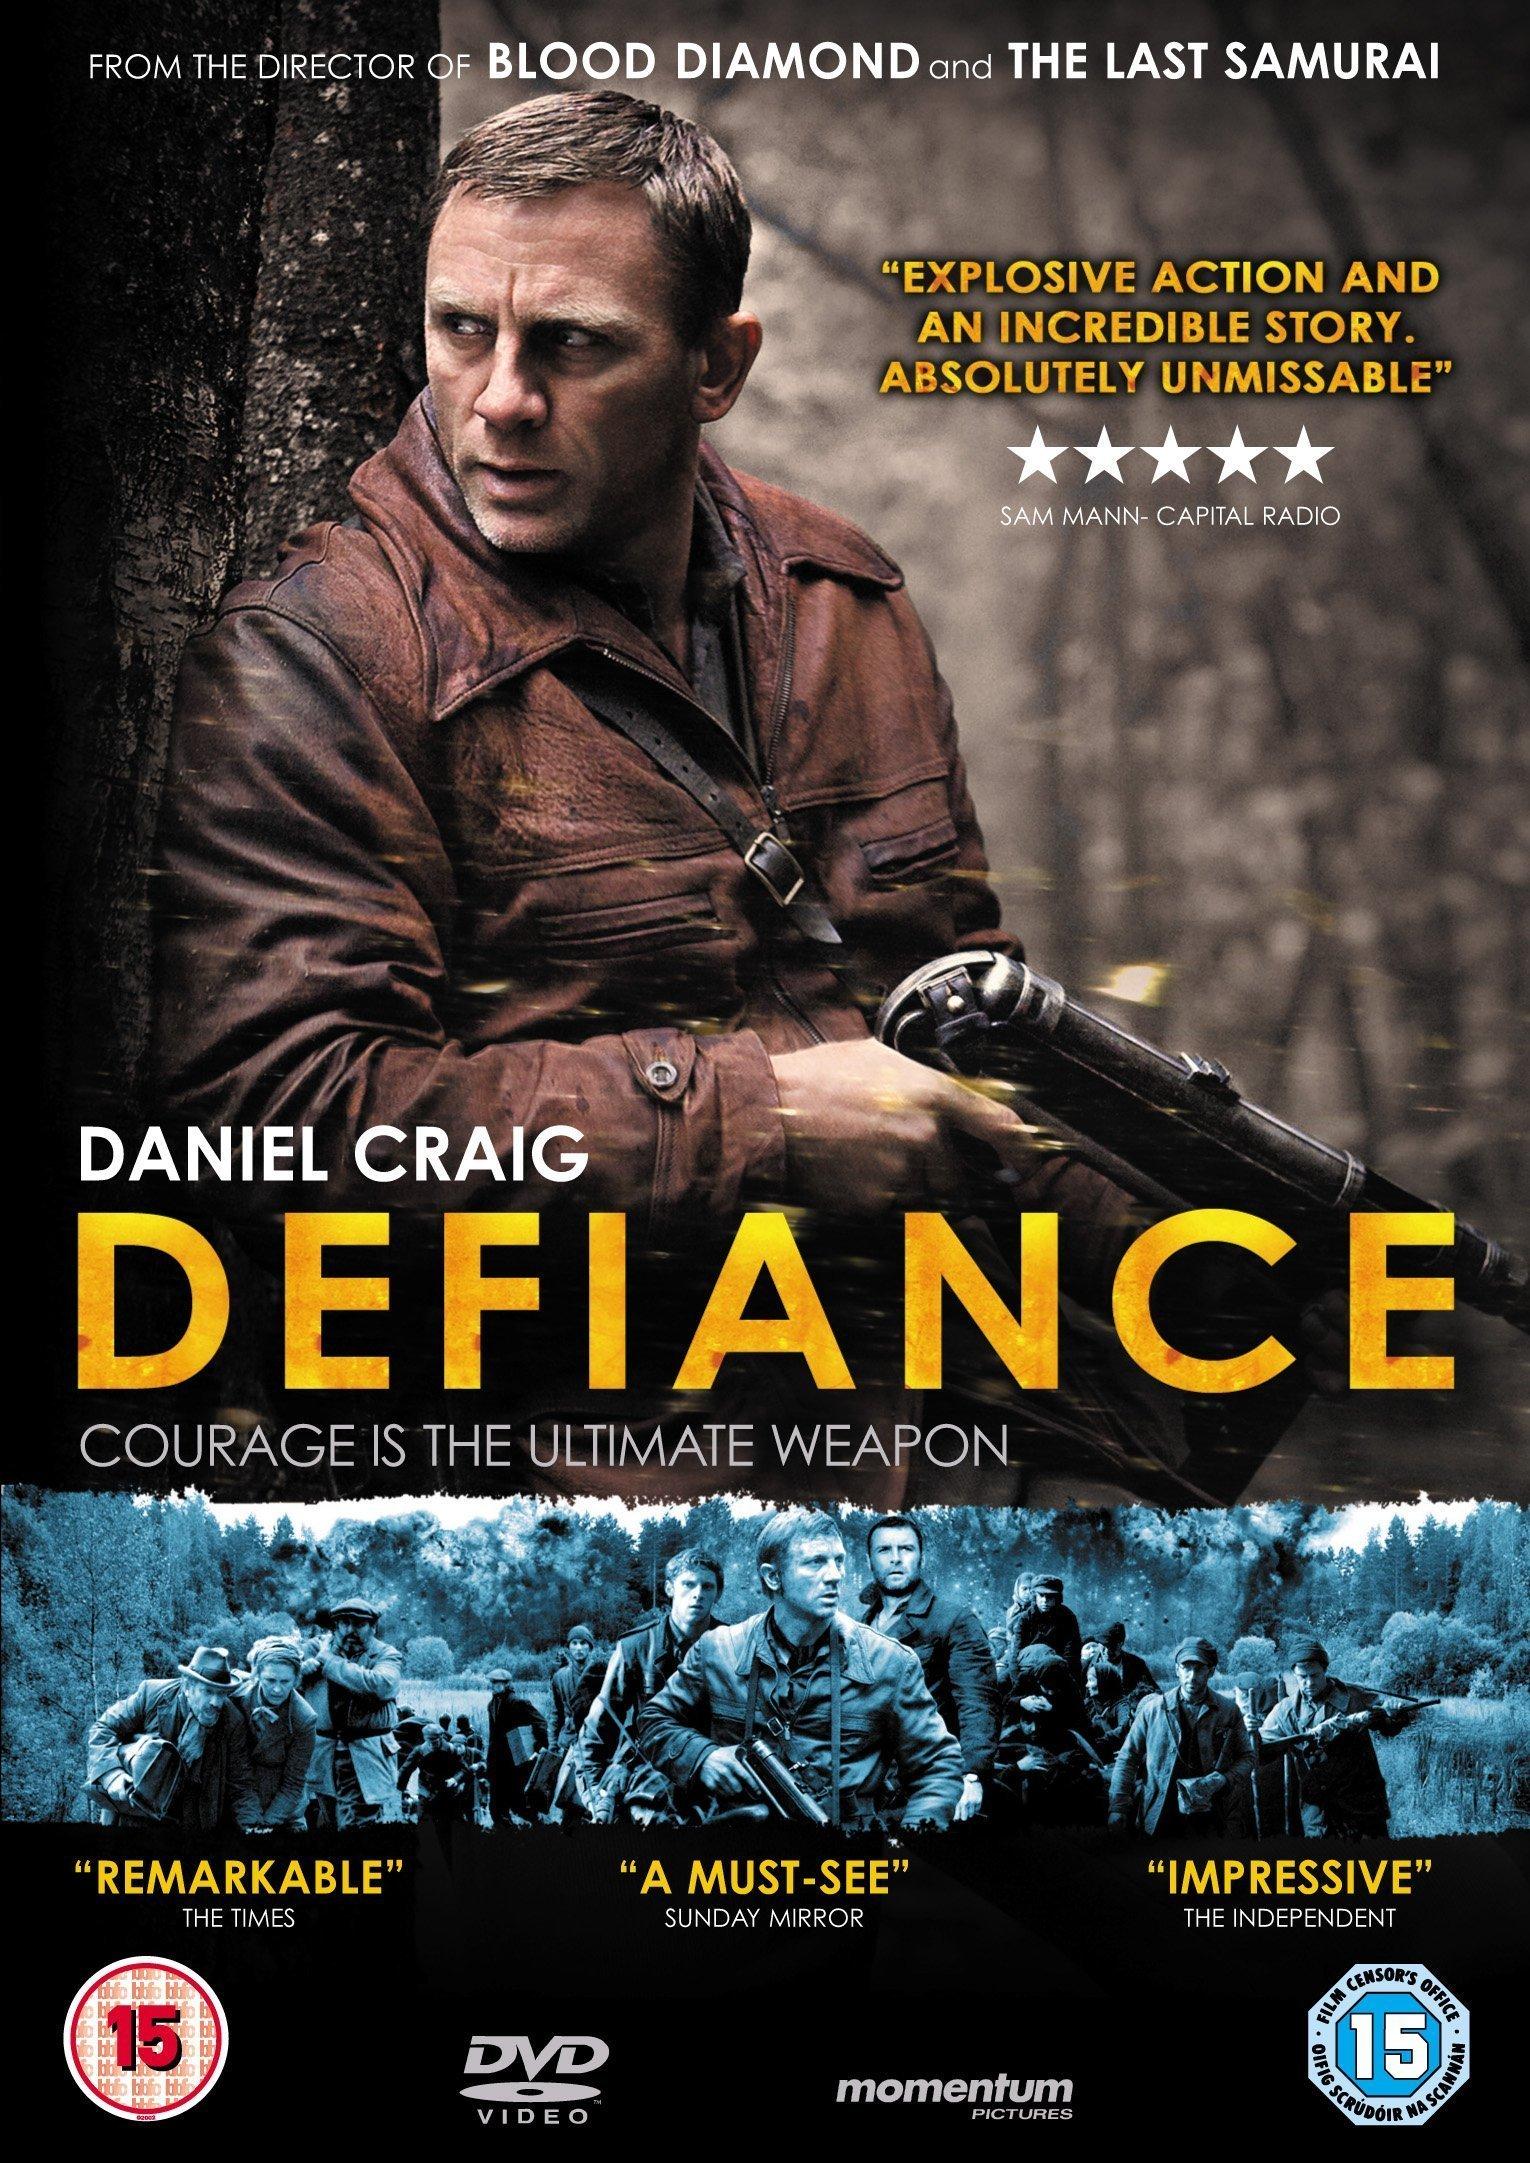 defiance 2008 poster freemoviepostersnet